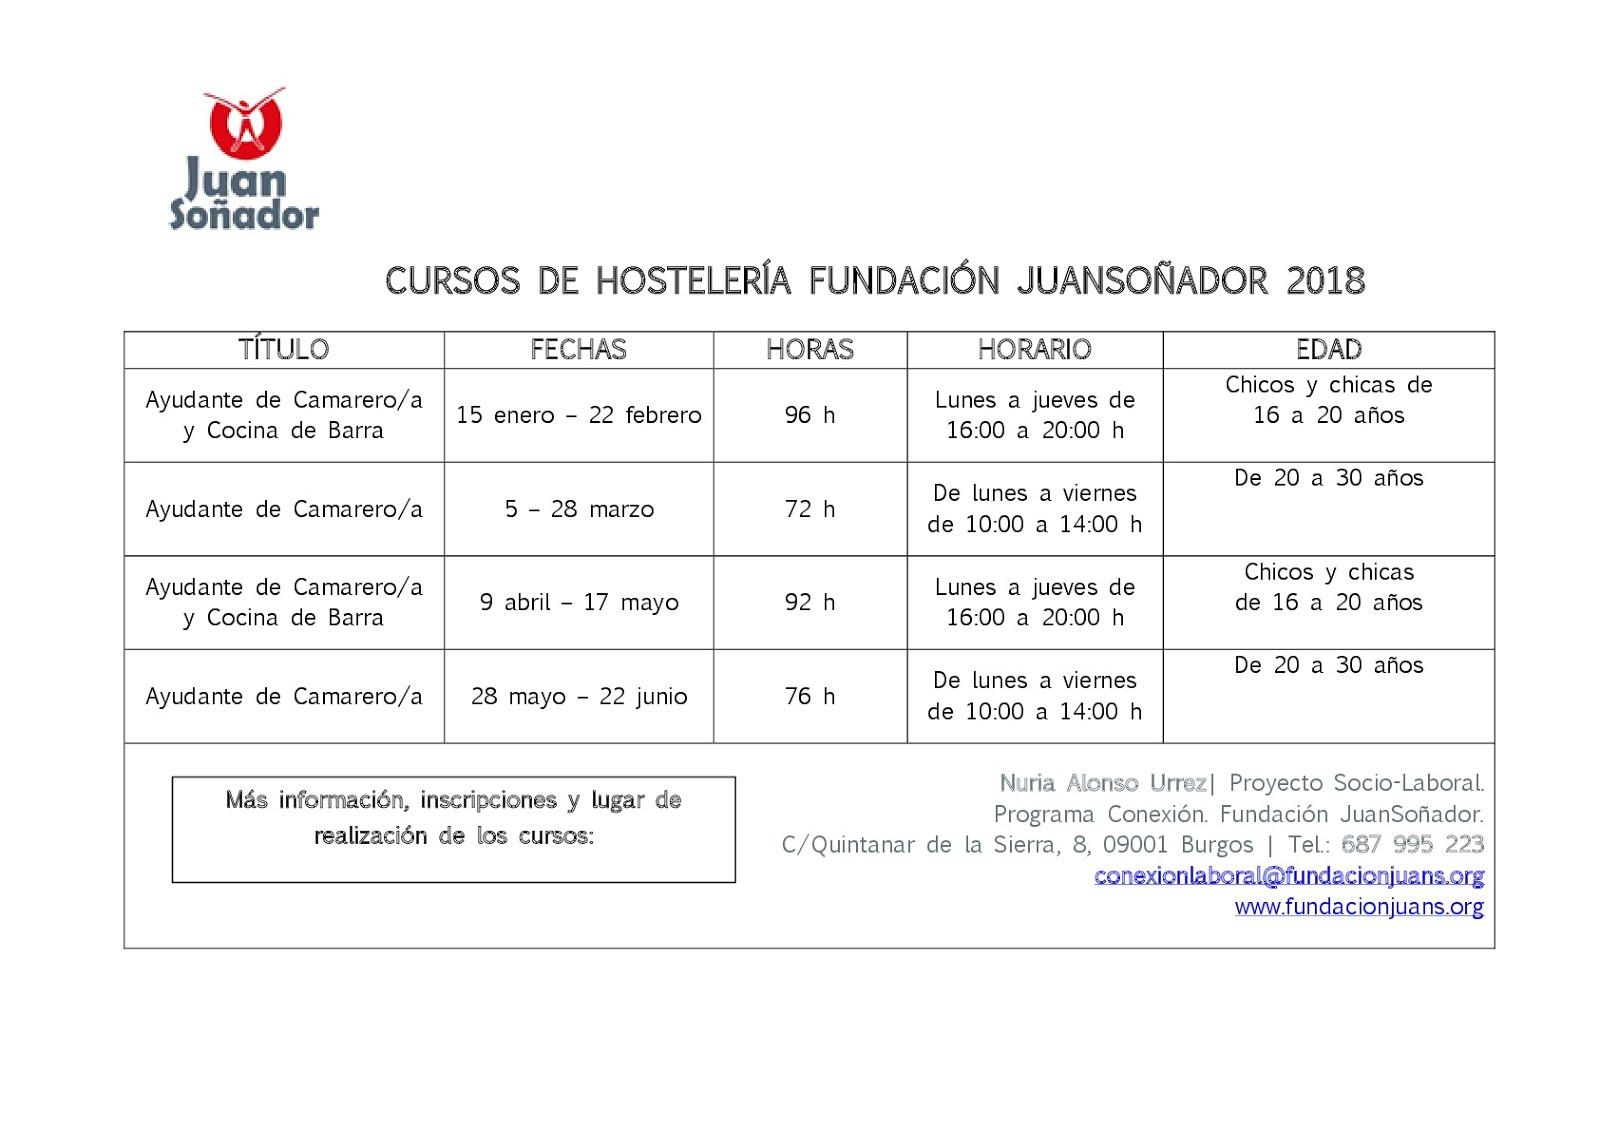 Cursos de Hostelería JuanSoñador 2018